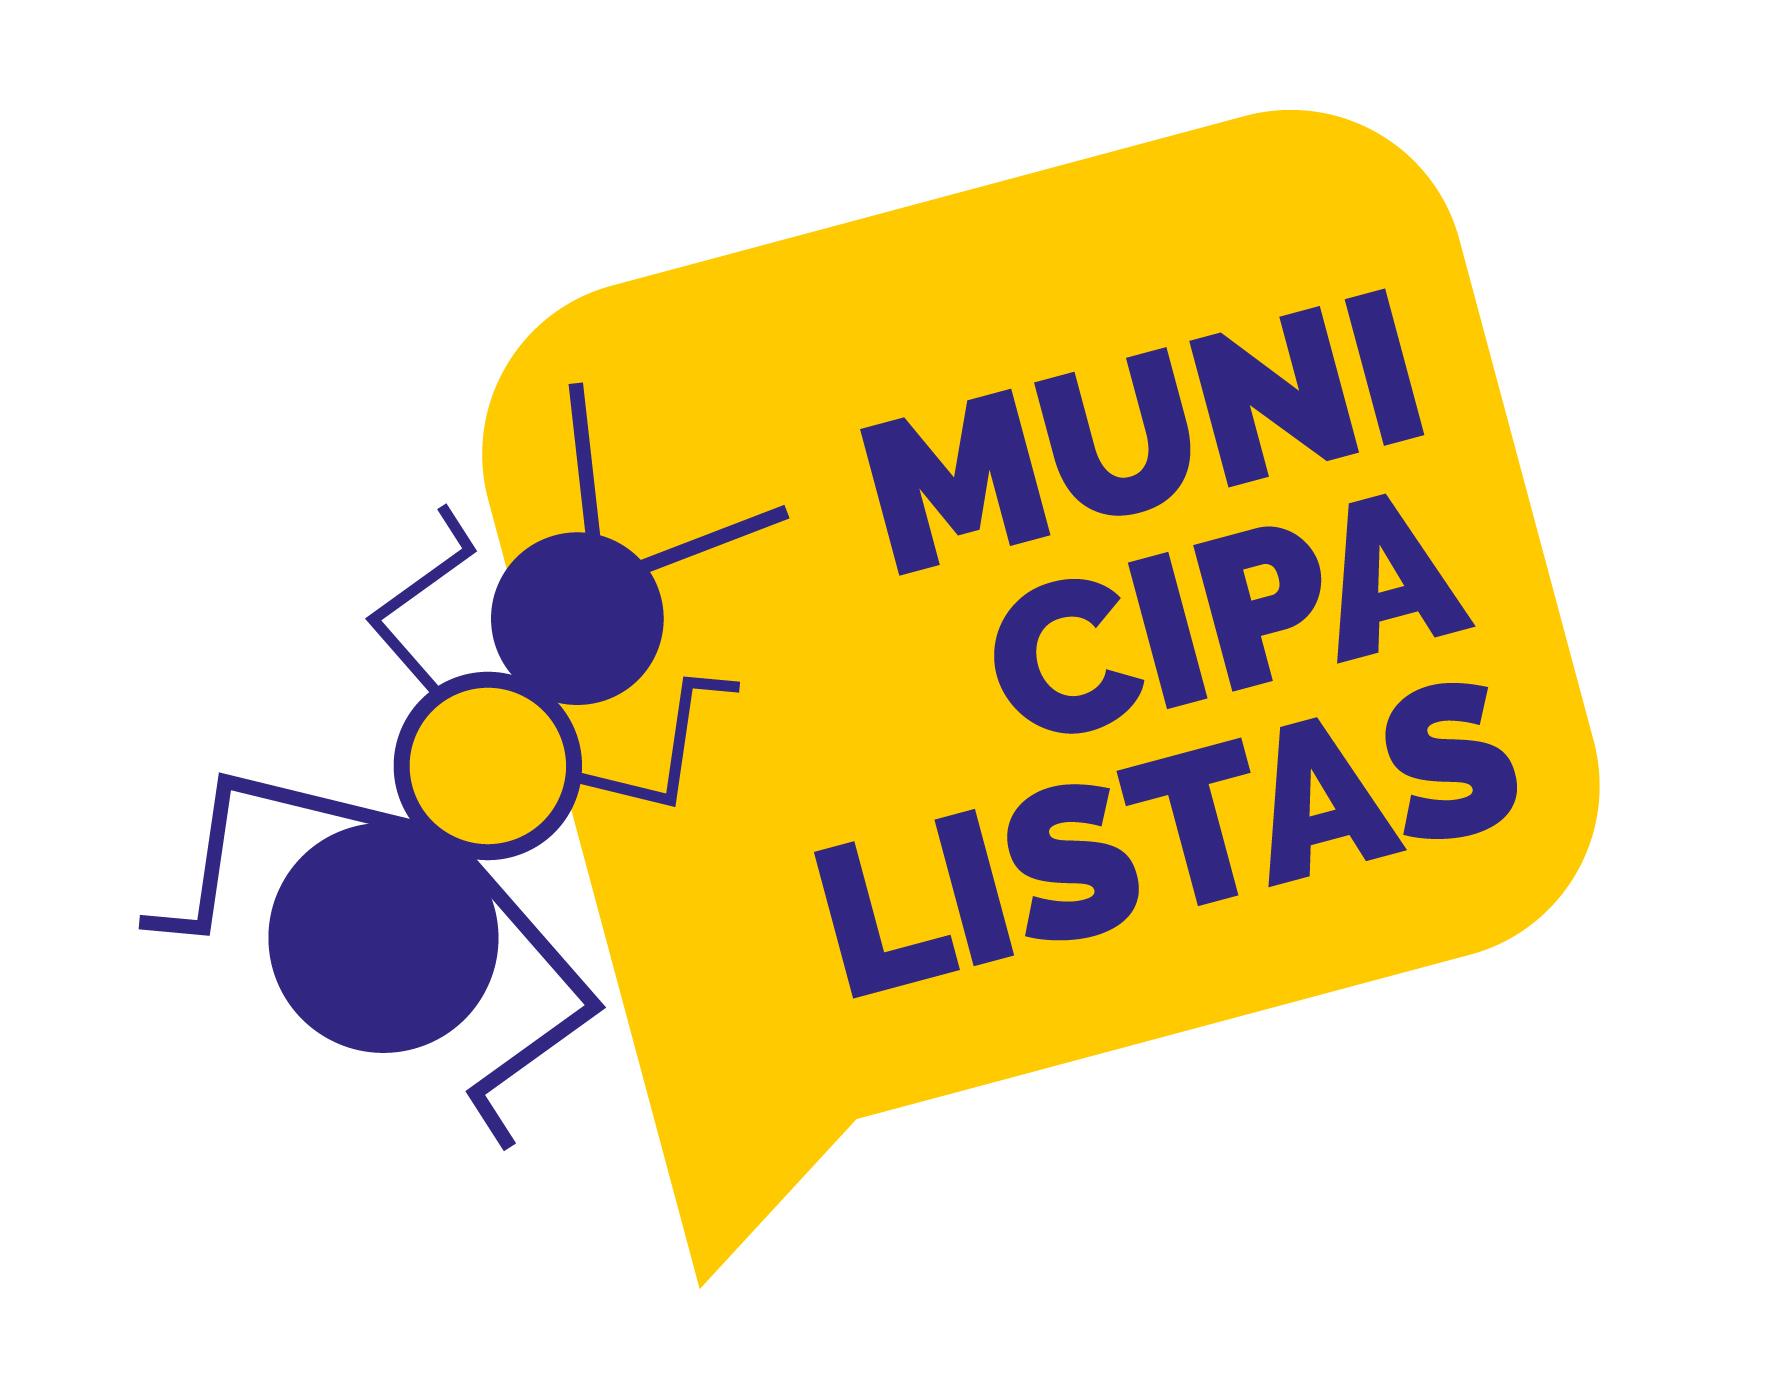 Candidaturas Municipalistas Logo